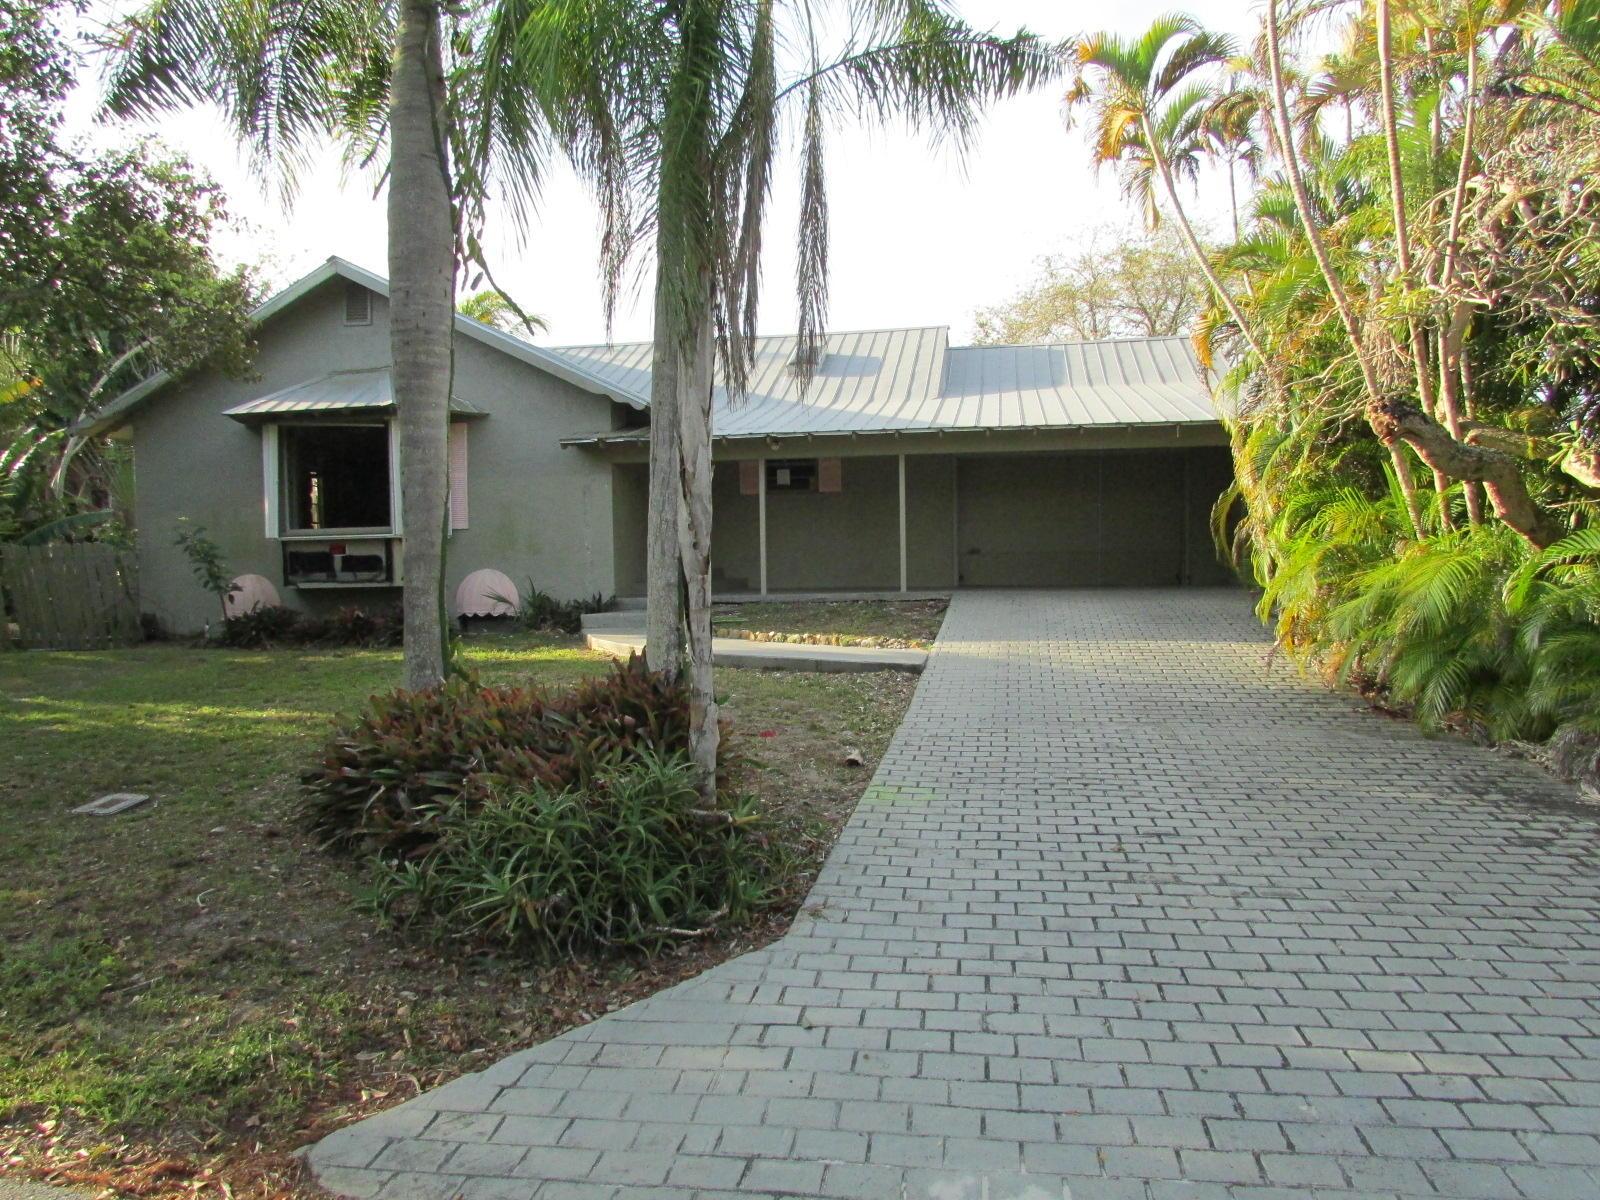 1054 SE Walters Terrace - Port St Lucie, Florida